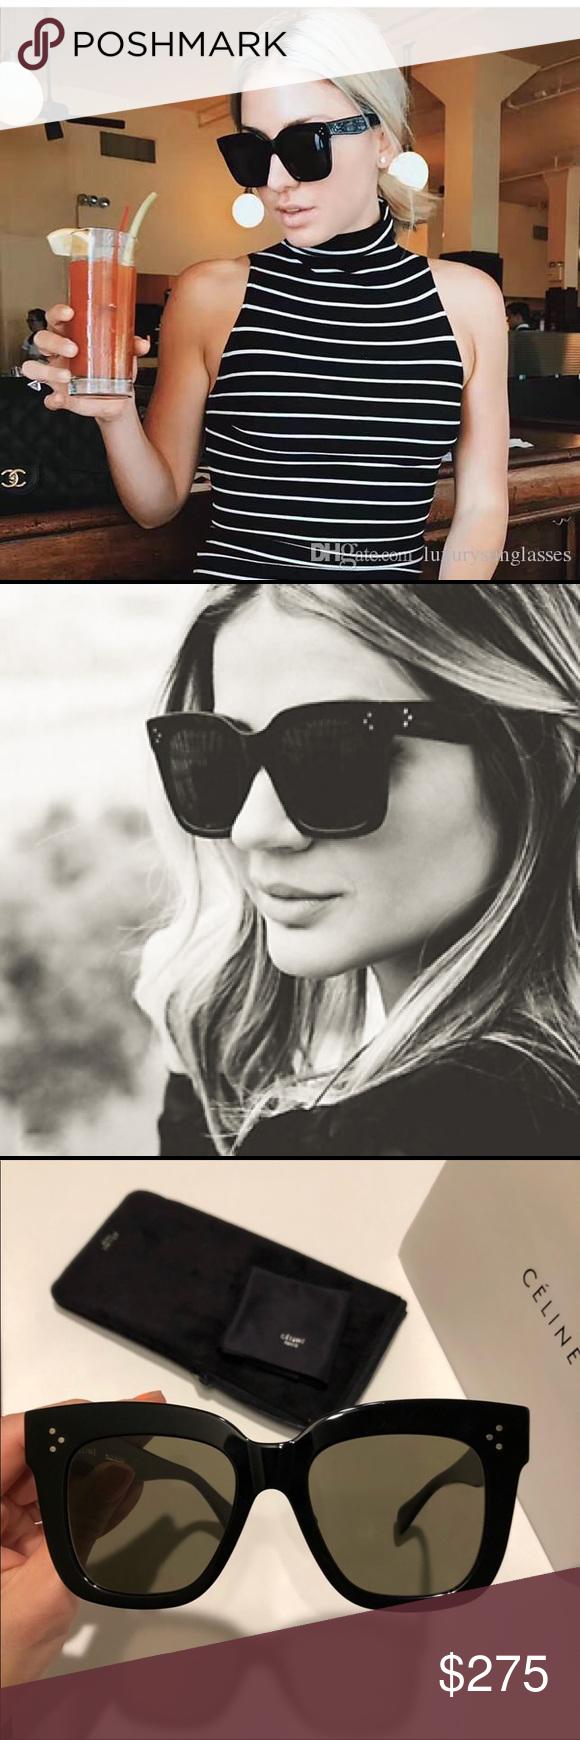 3fcb0f2b218 Celine Kim sunglasses Celine 41444 s Kim Black grey sunglasses New  condition. 100% authentic Includes Celine case and Celine cloth. Celine  Accessories ...